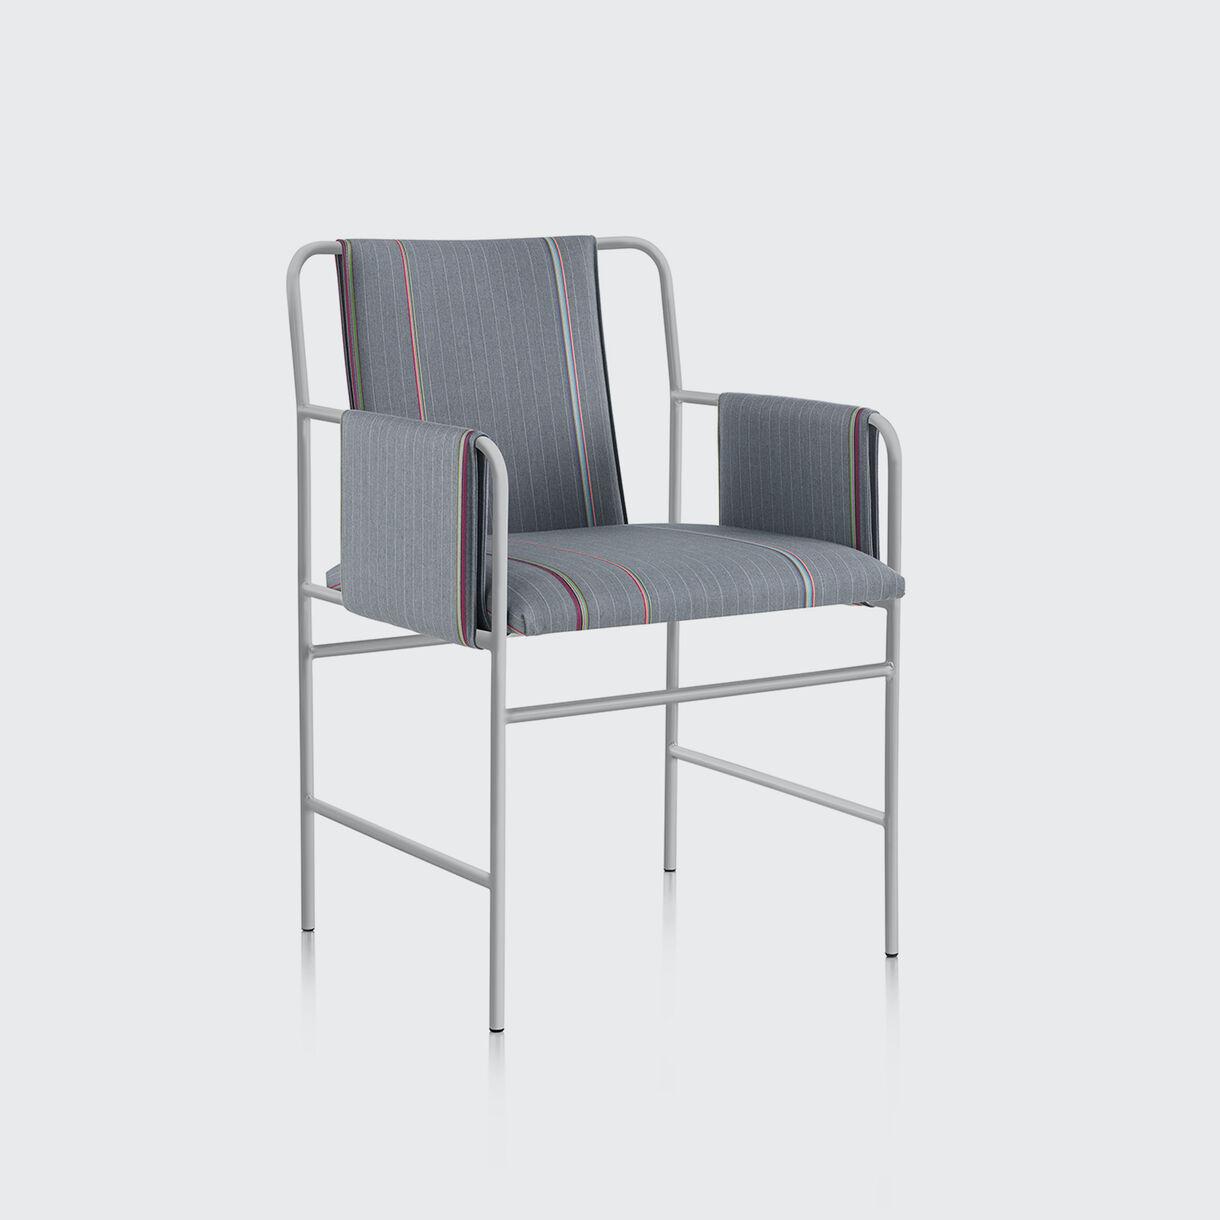 Envelope Chair, Paul Smith x Maraham